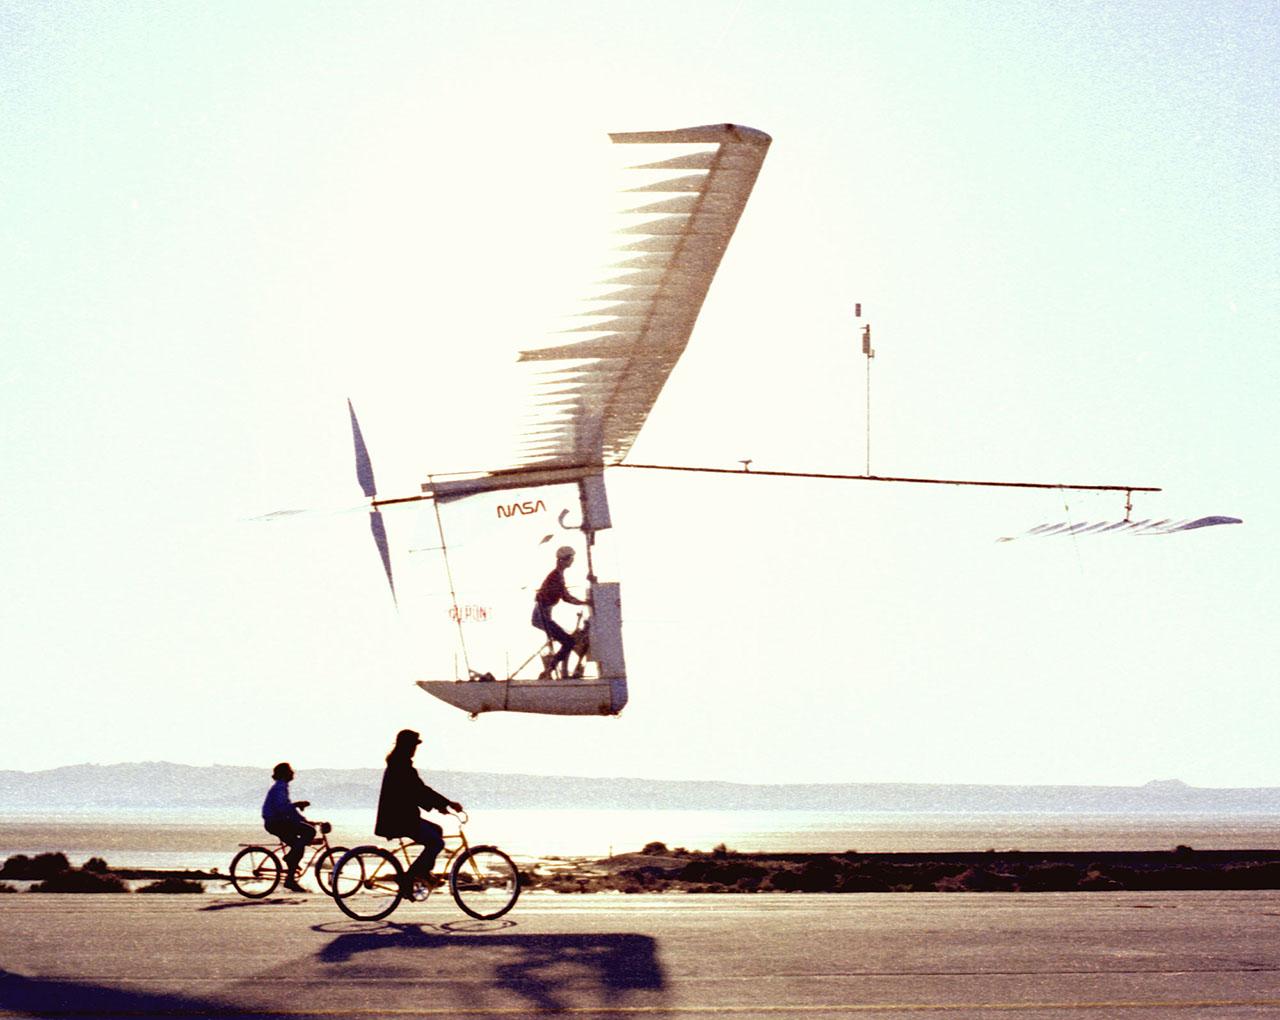 The Gossamer Albatross in flight.